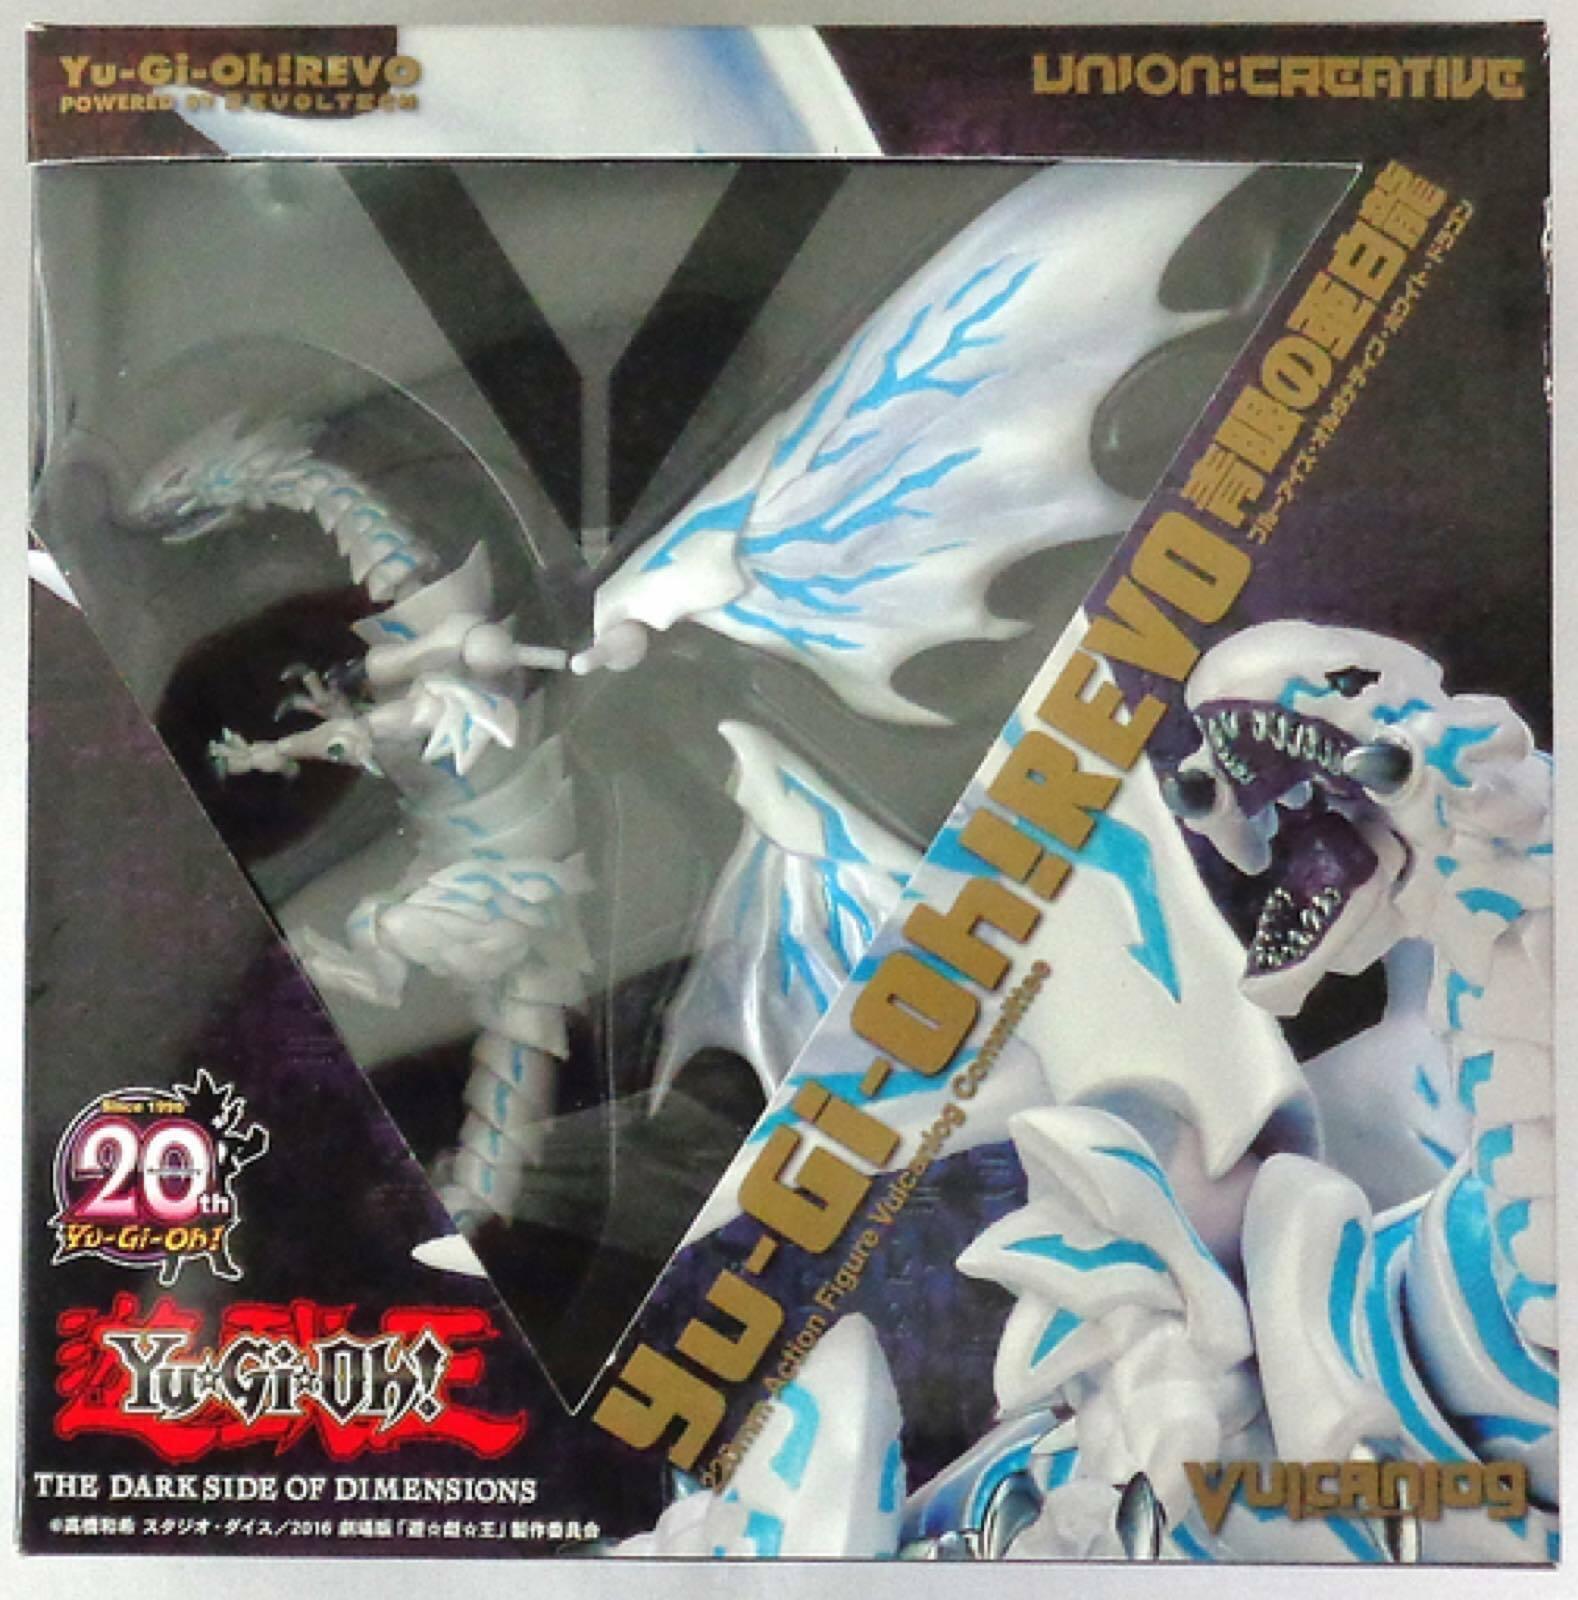 Vulcanlog 013 Yu-Gi-Oh  Revo ojos azules Dragón blancoo alternativa Unión creativo